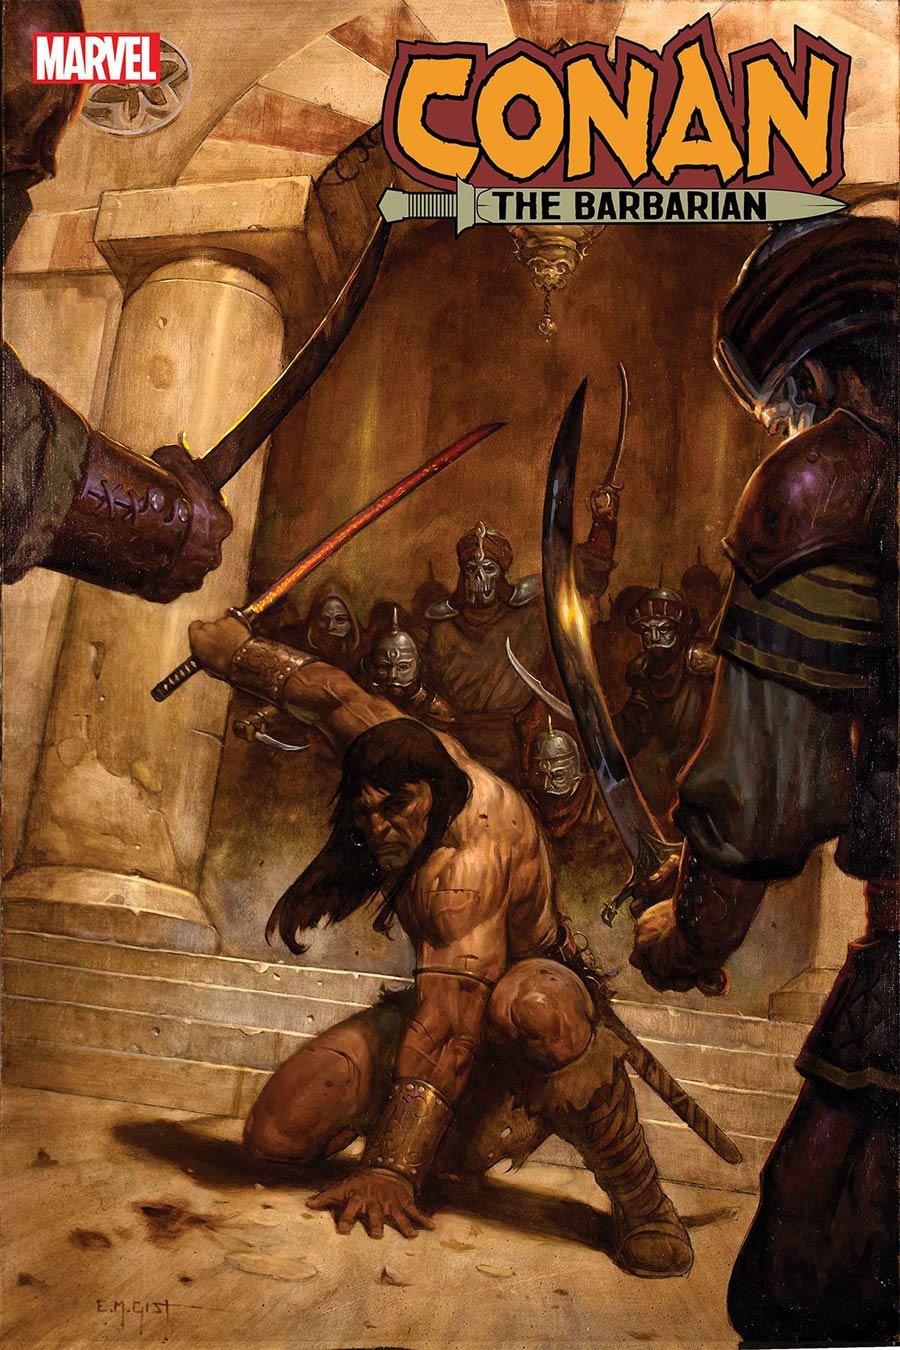 Conan The Barbarian Vol 4 #16 Cover A Regular EM Gist Cover